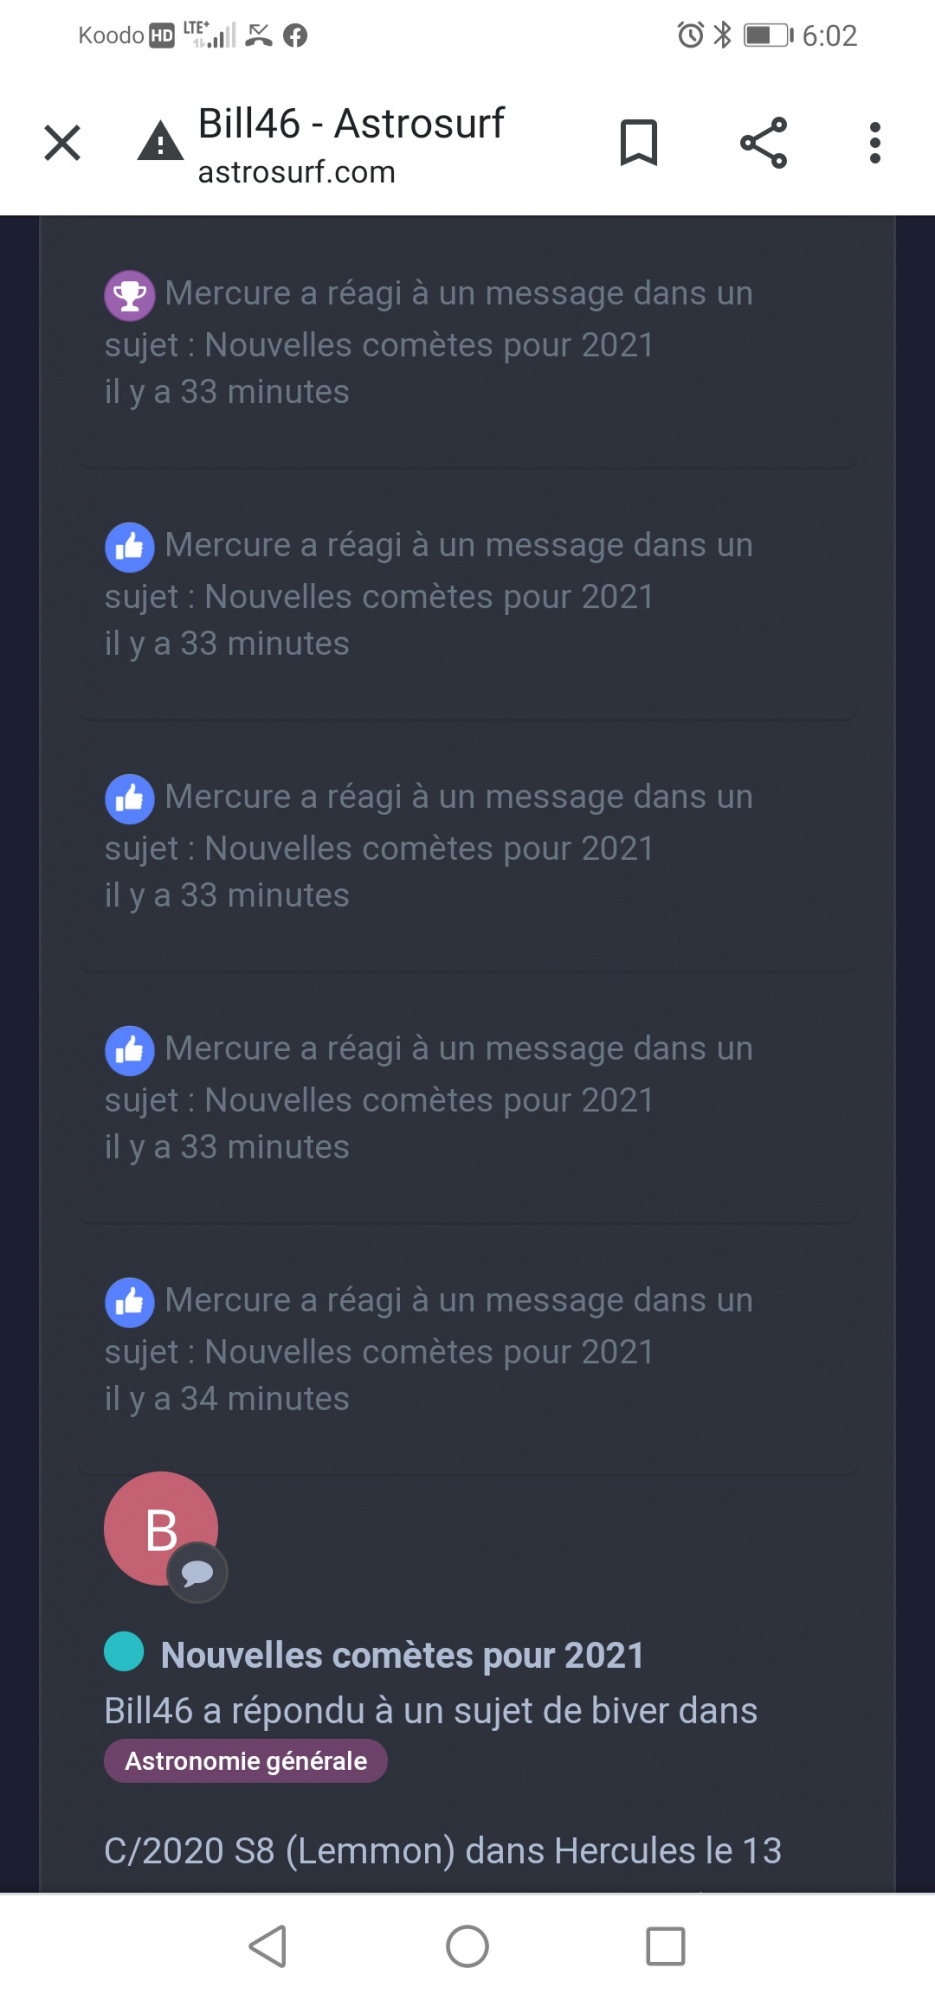 Screenshot_20210317_180239_com.android.chrome.thumb.jpg.c5ffb704820e791aa03b6a5426ab952b.jpg